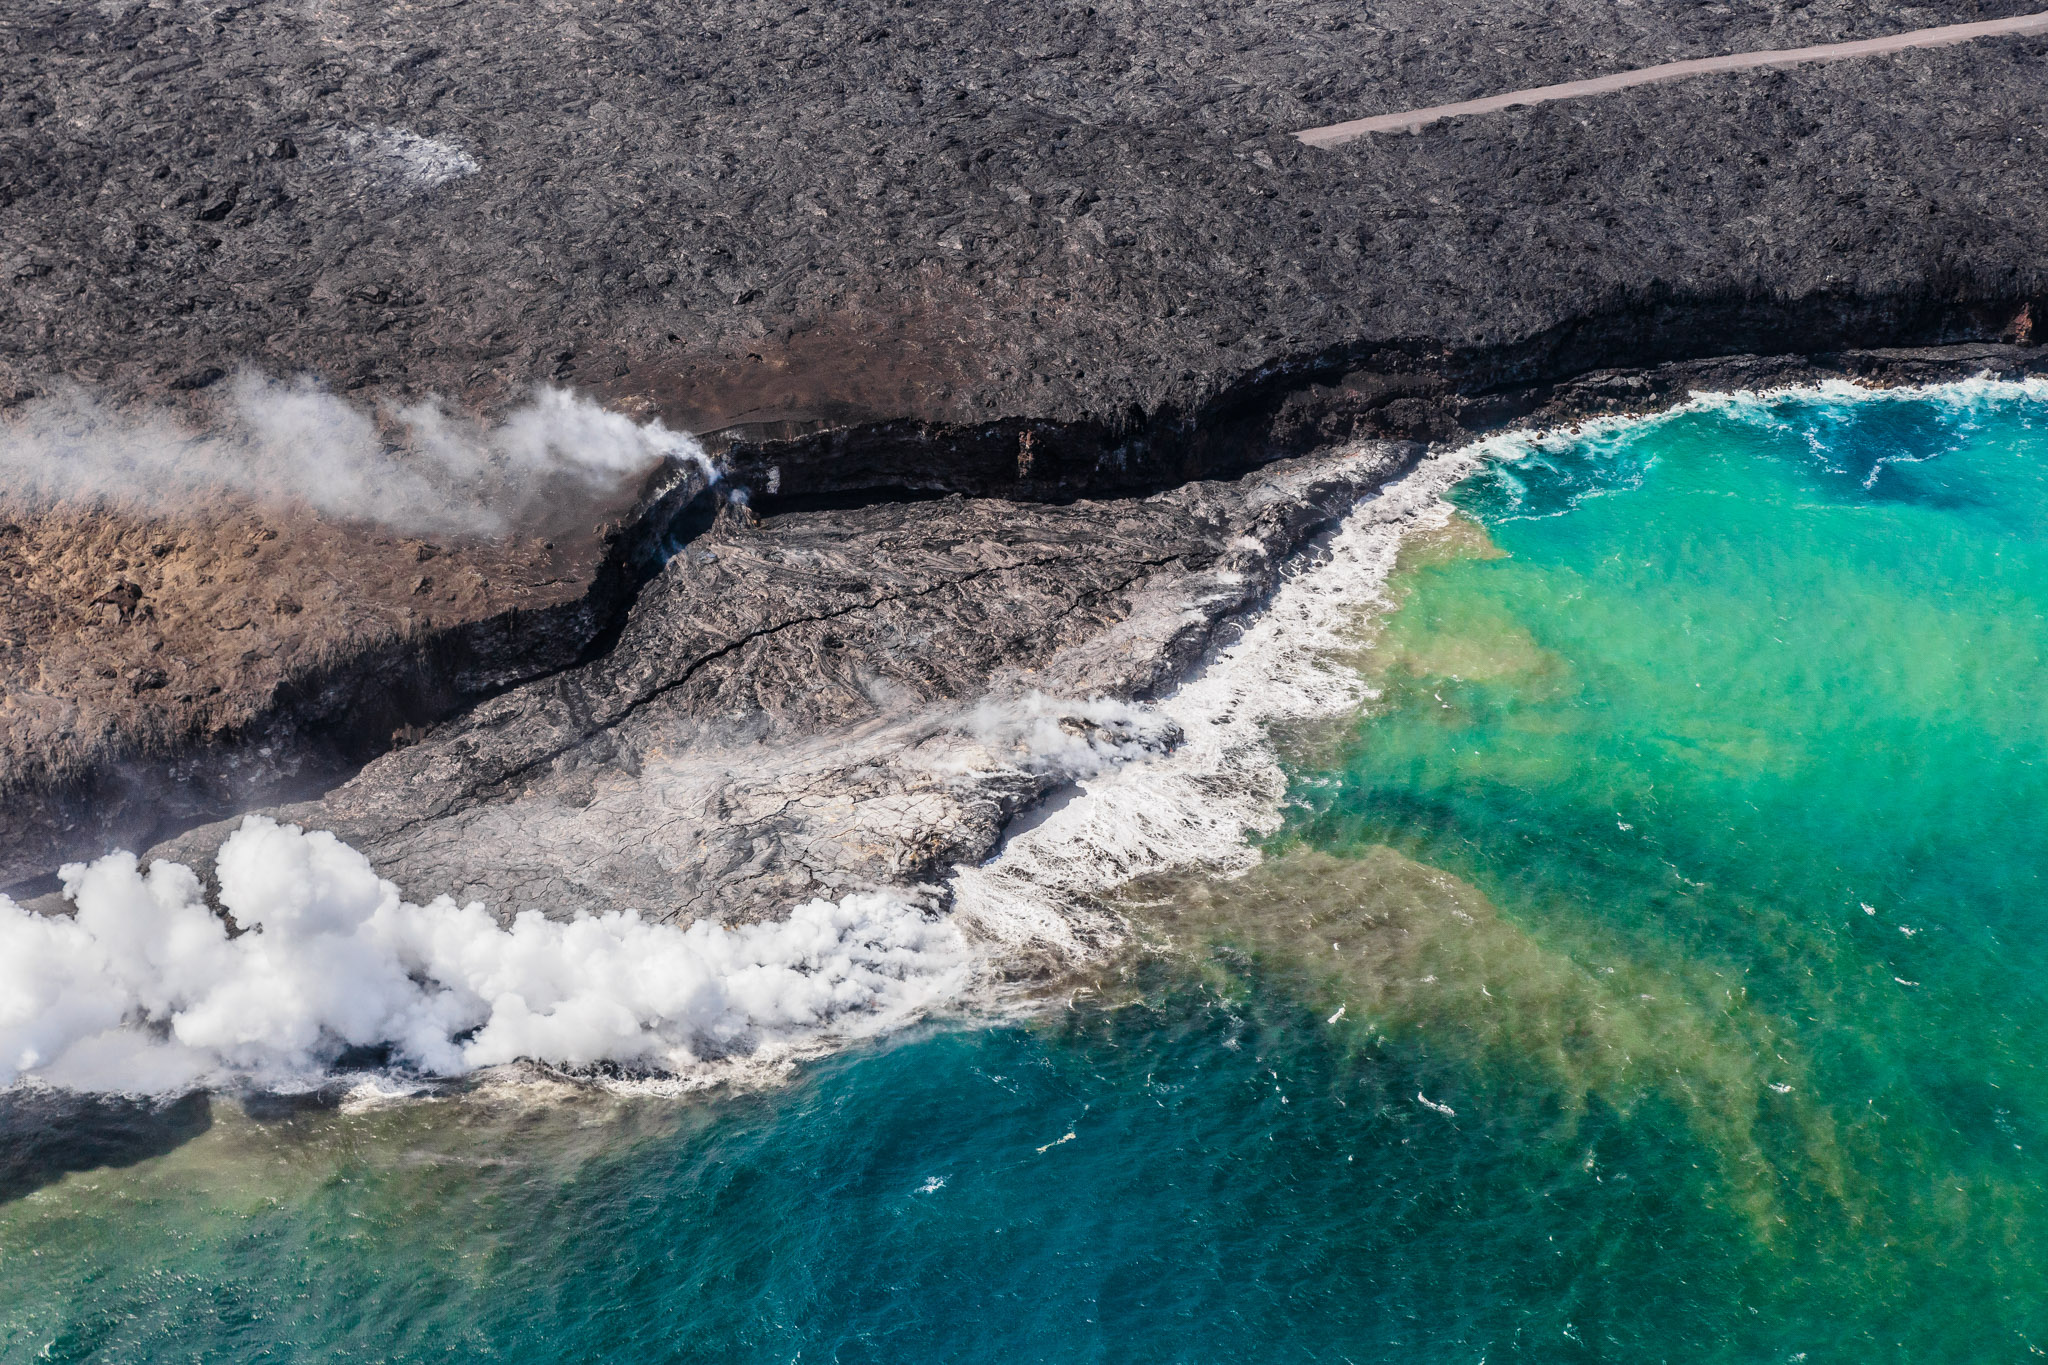 Helicopter flight over the Big Island lava flow // 10 Things You Have to Do on the Big Island of Hawaii // www.readysetjetset.net #readysetjetset #hawaii #bigisland #blogpost #hawaiiguide